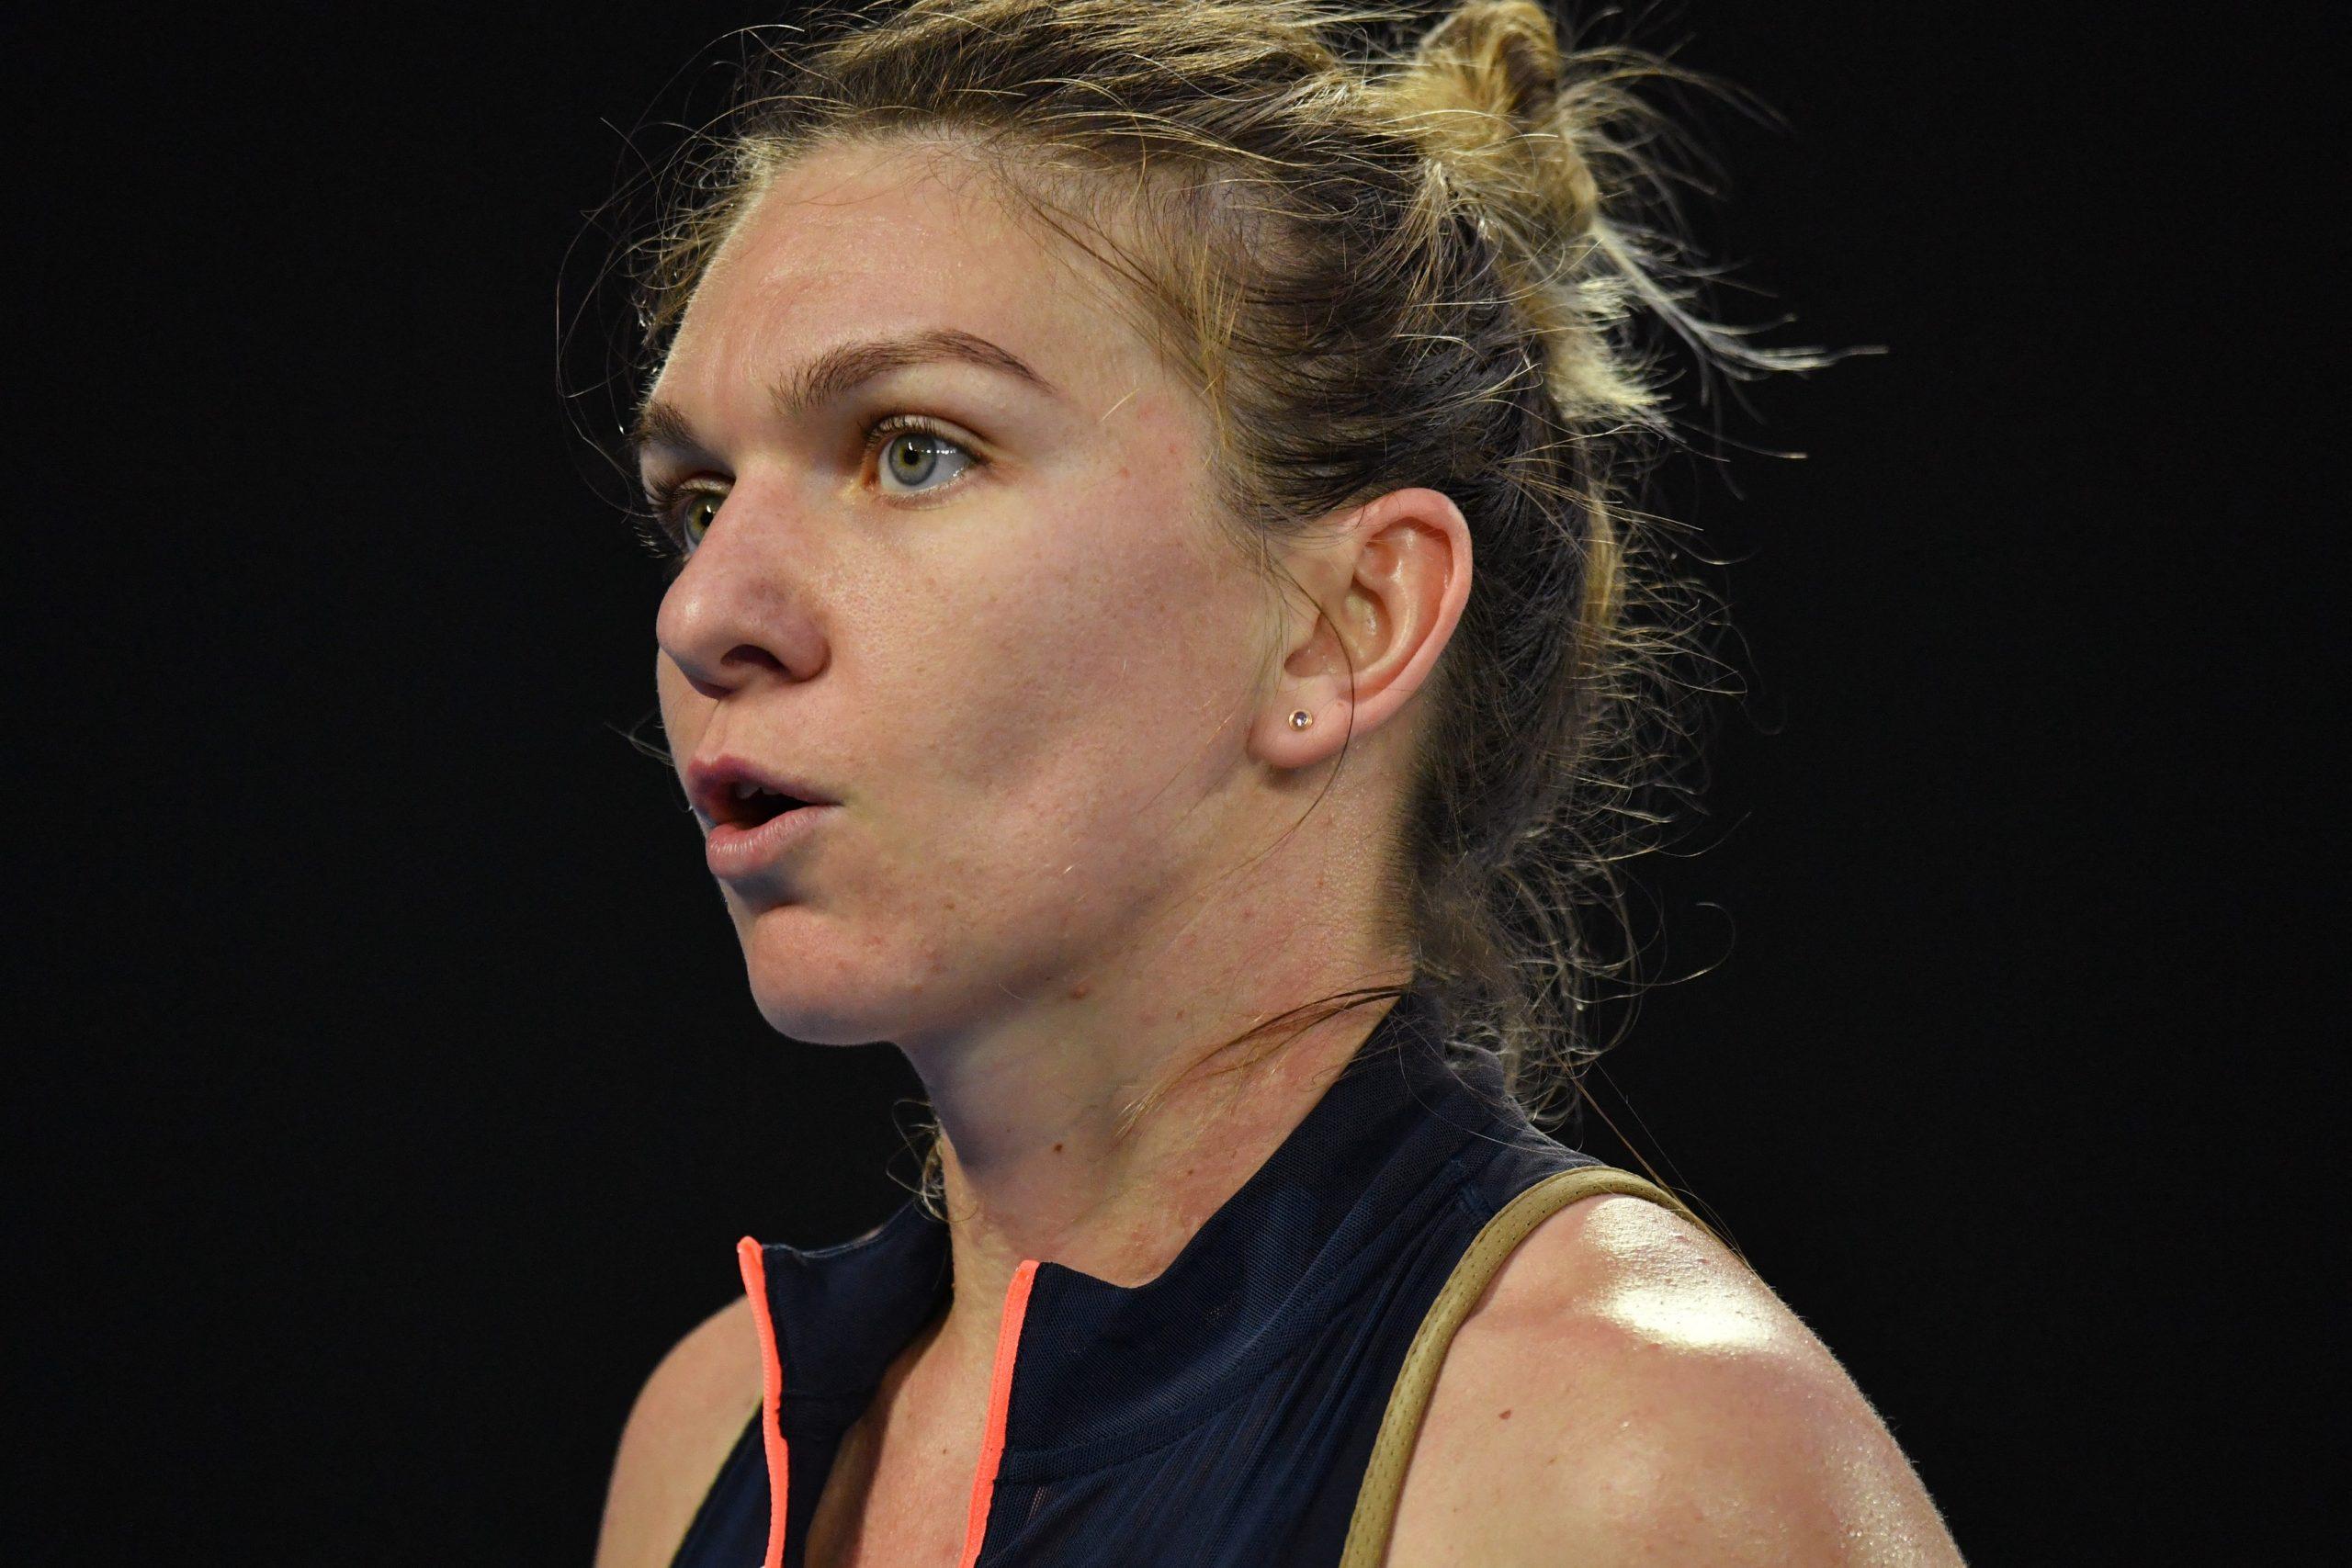 Simona Halep Australian Open castigator scaled